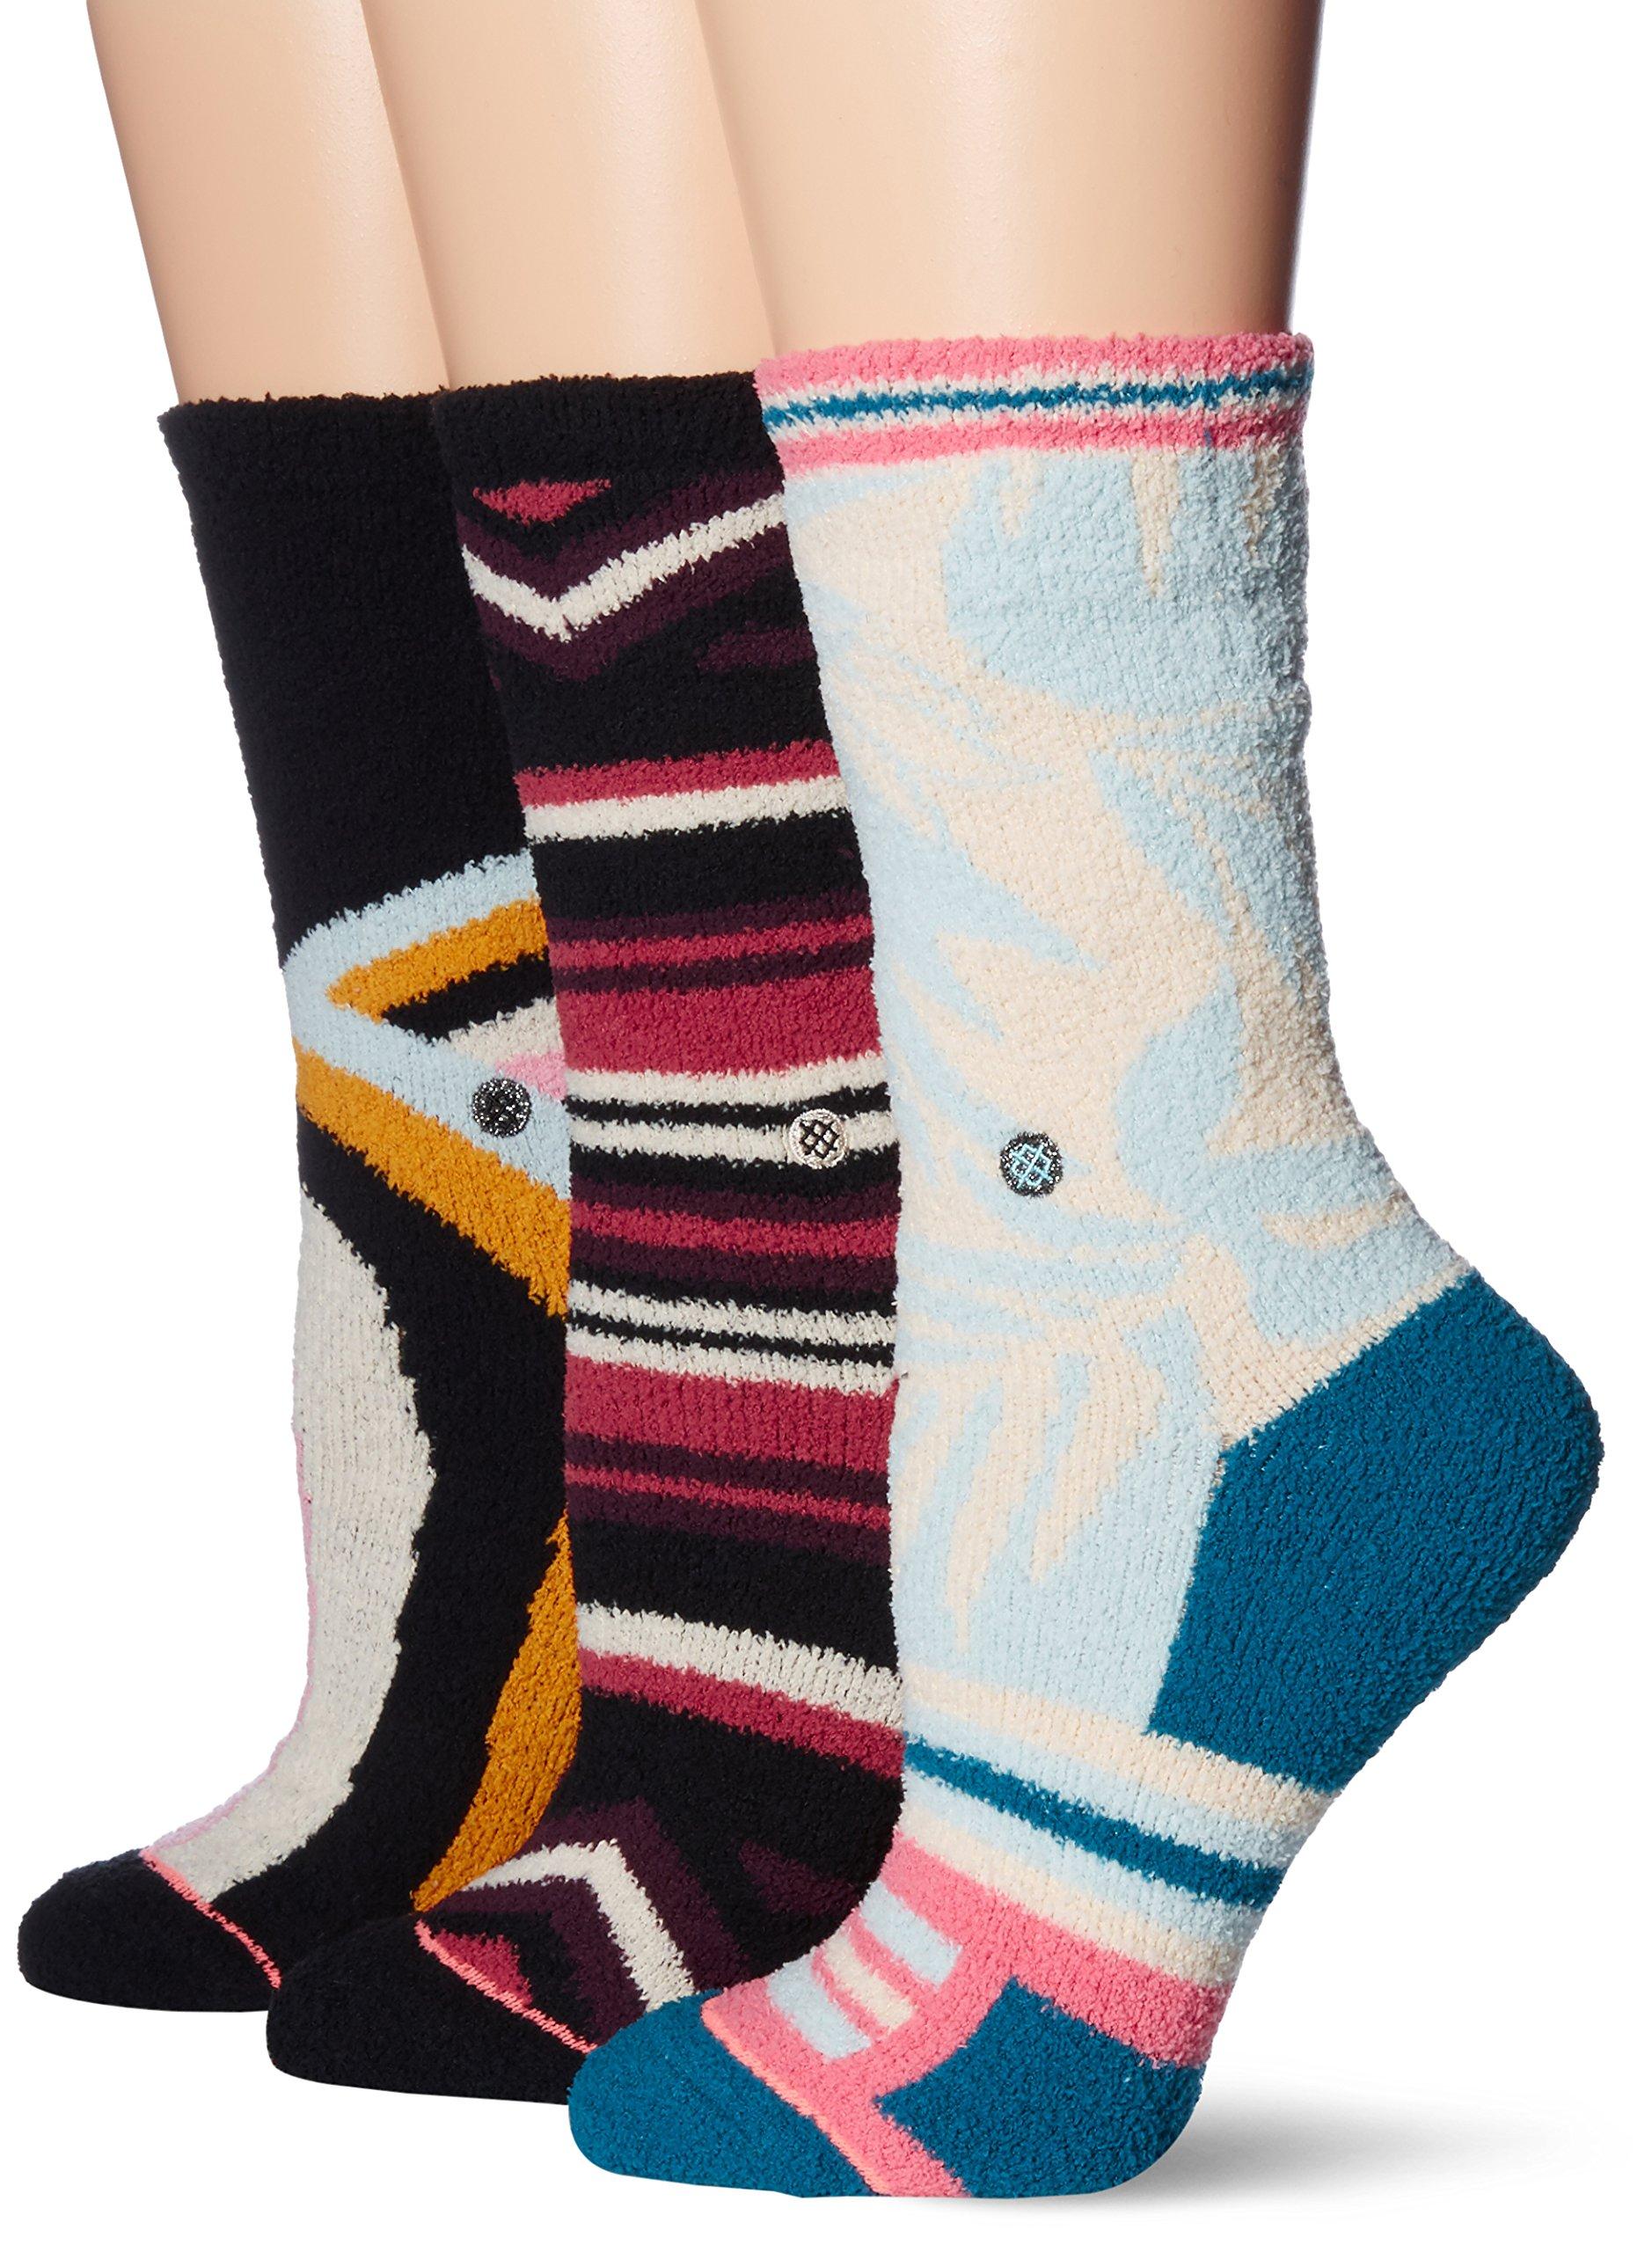 Stance Women's 3 Pack Holiday Socks Gift Box Set, Multi, Medium by Stance